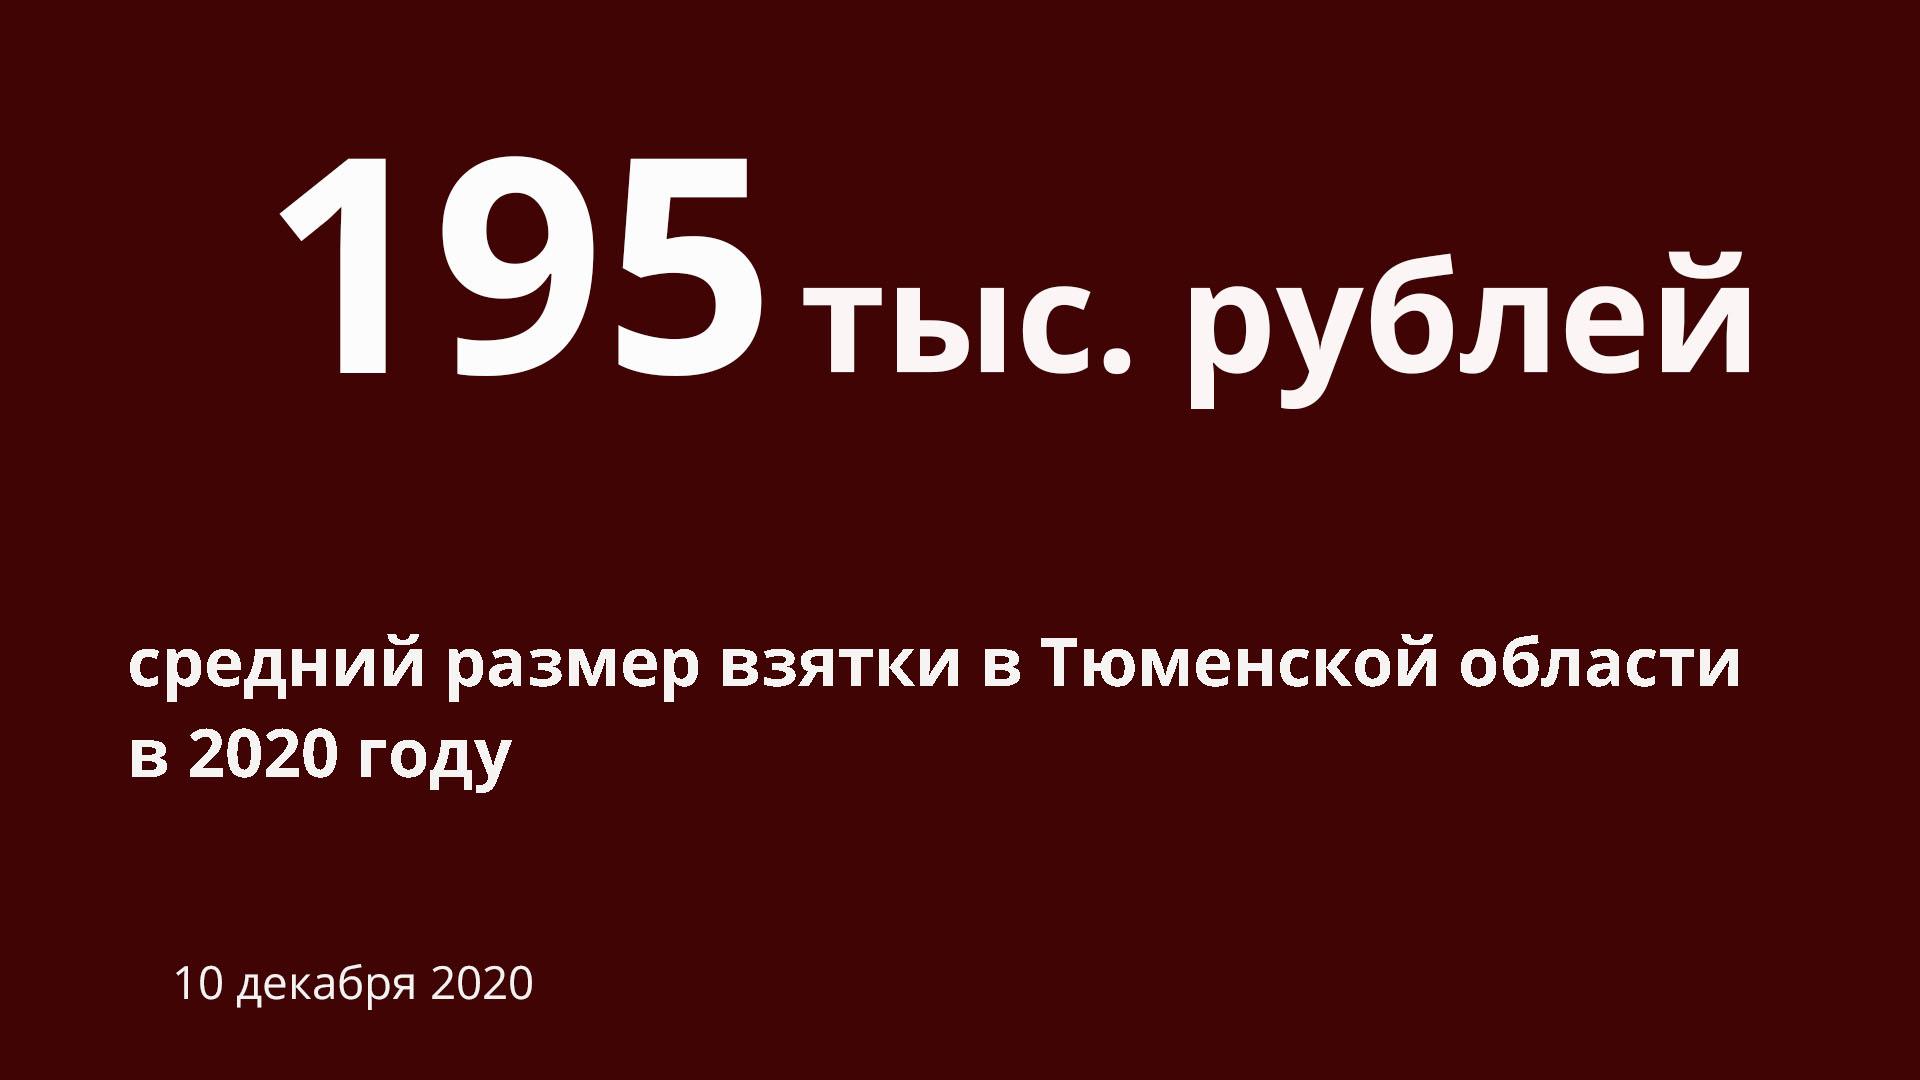 Сумма средней взятки в Тюменской области за год увеличилась в три раза